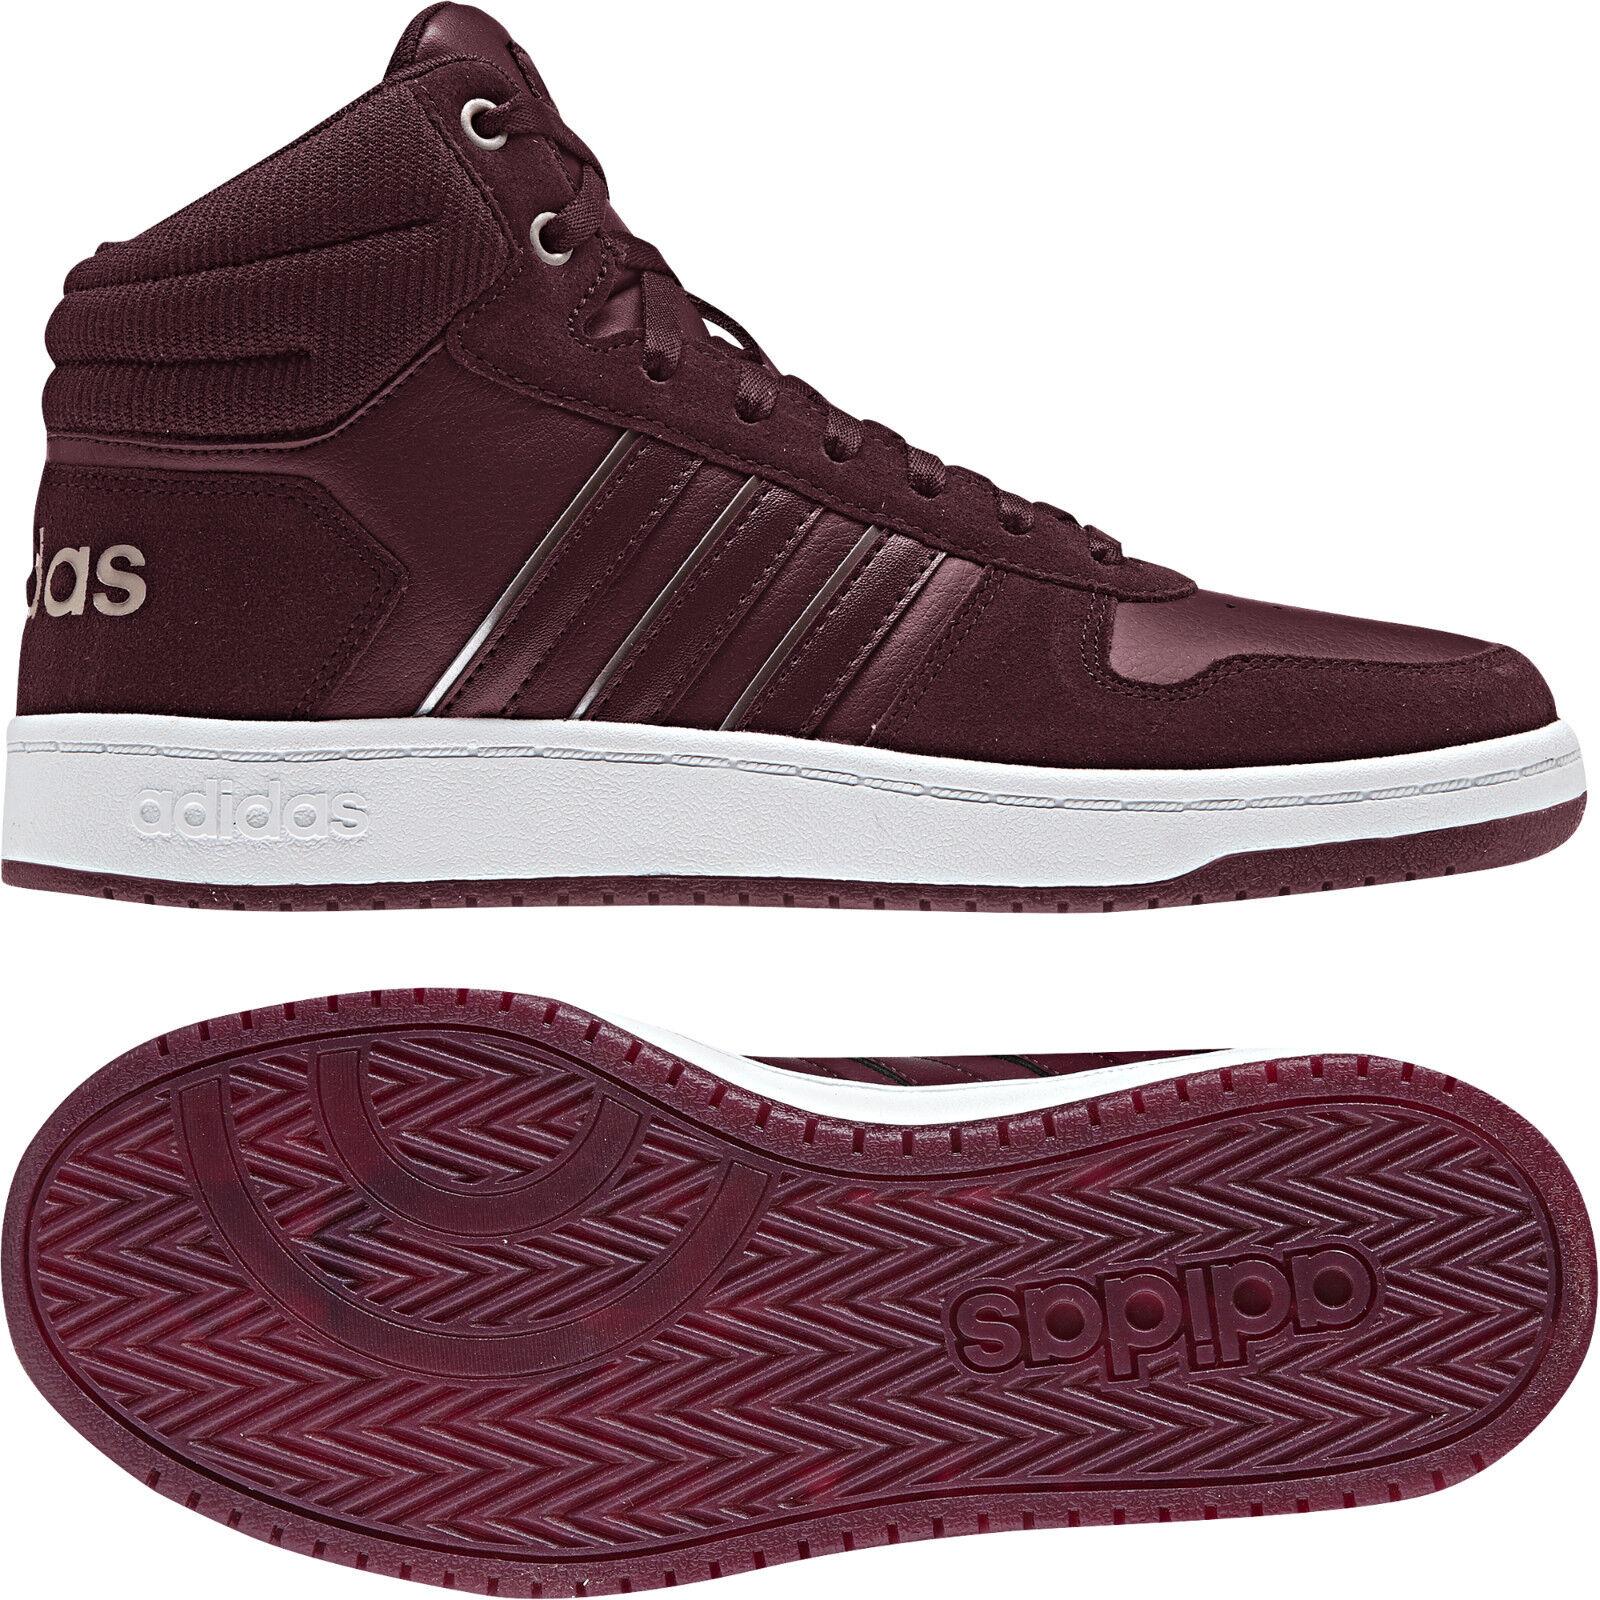 Adidas ΓυναικΡία παπούτσια Casual πάνινα παπούτσια ΞΌΟŒΞ΄Ξ±Ο' Σκουλαρίκια Mid ποδοσφαιριστές που τρέχουν B42108 Νέα